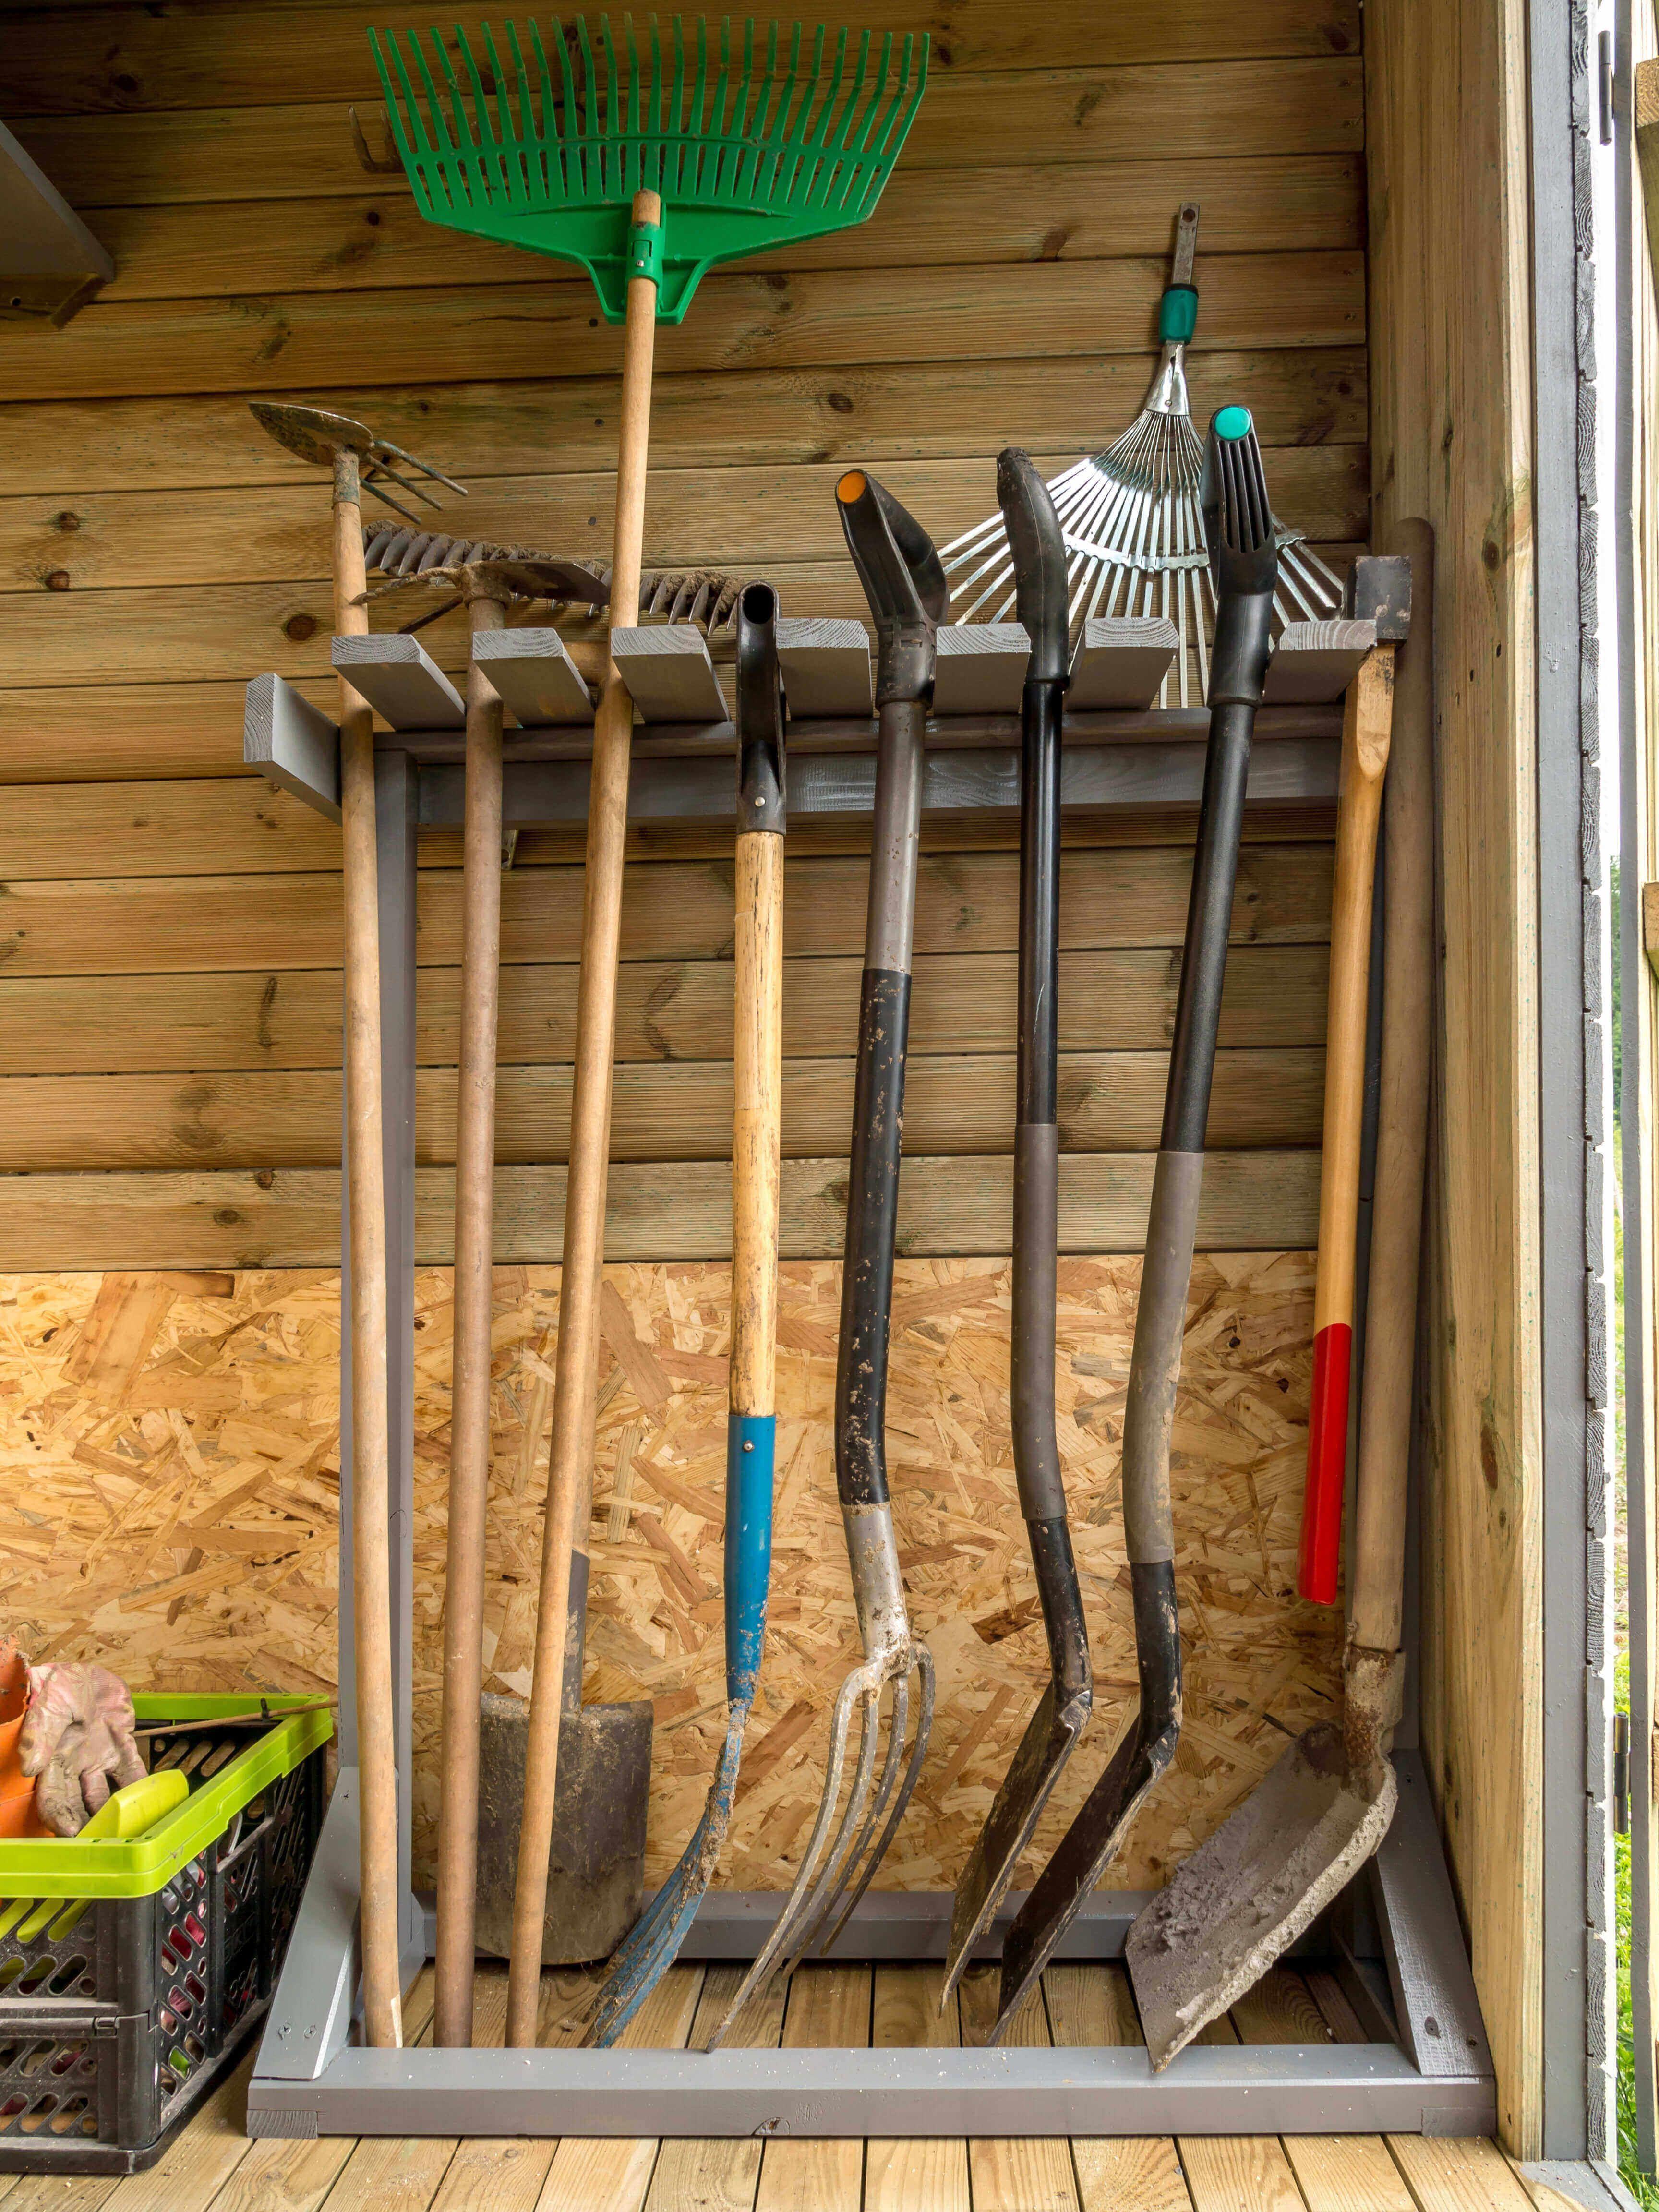 14 Creative Diy Garden Tool Storage Ideas With Images Garden